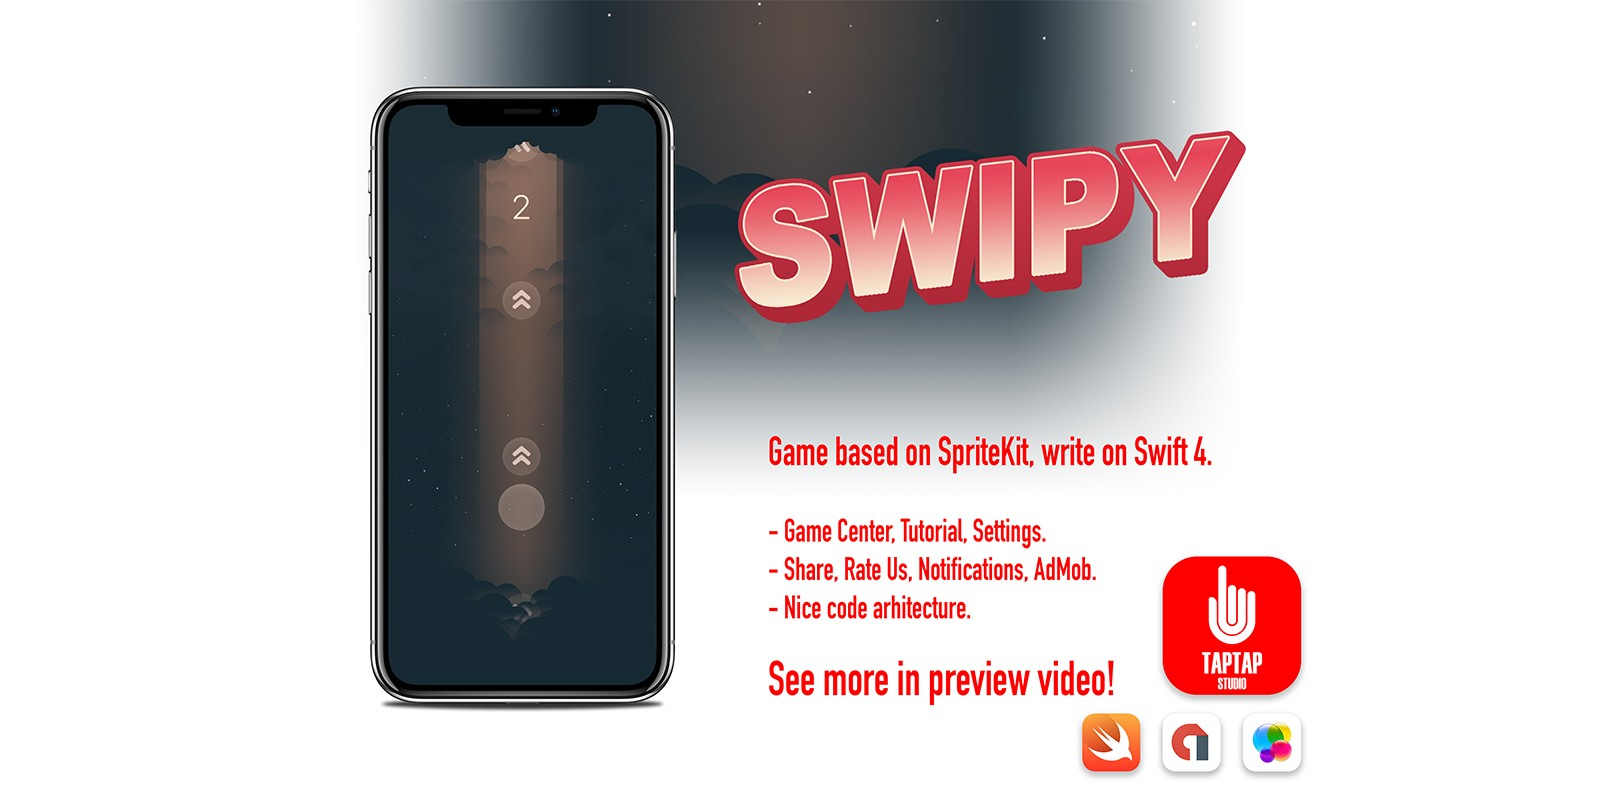 Swipy - iOS Game Source Code